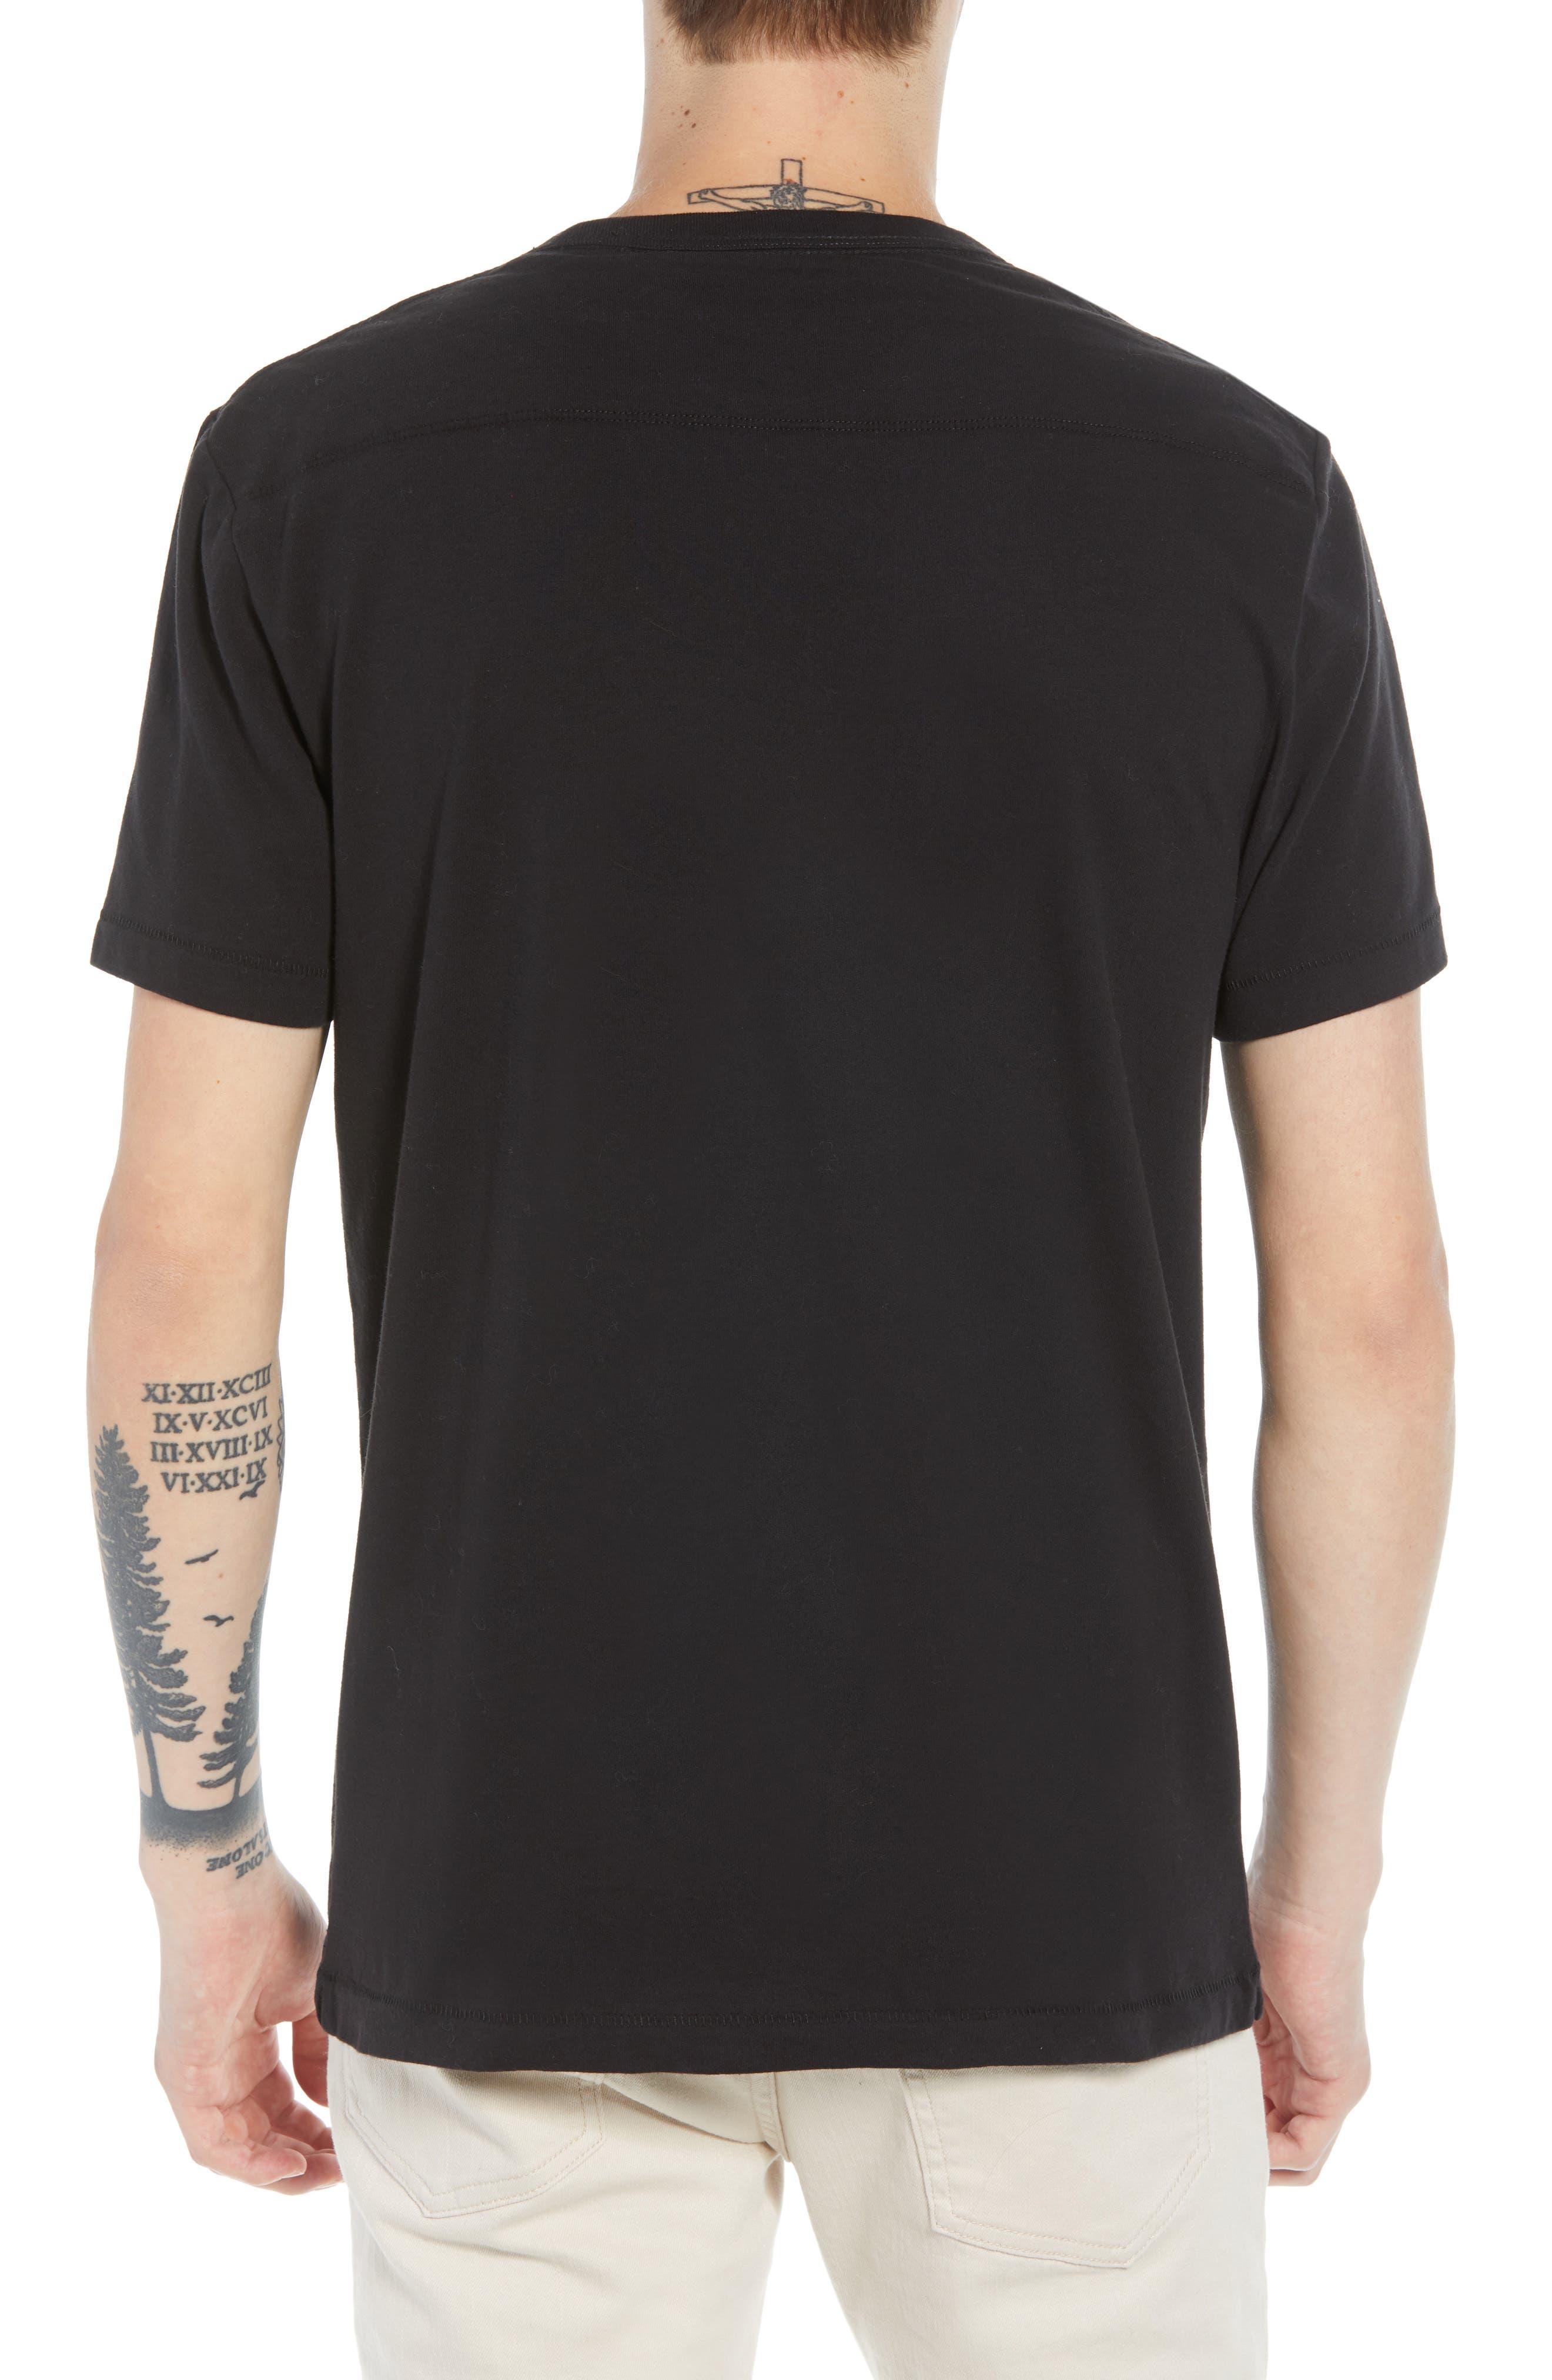 Love Struck T-Shirt,                             Alternate thumbnail 2, color,                             BLACK CALLUNA YELLOW WHITE